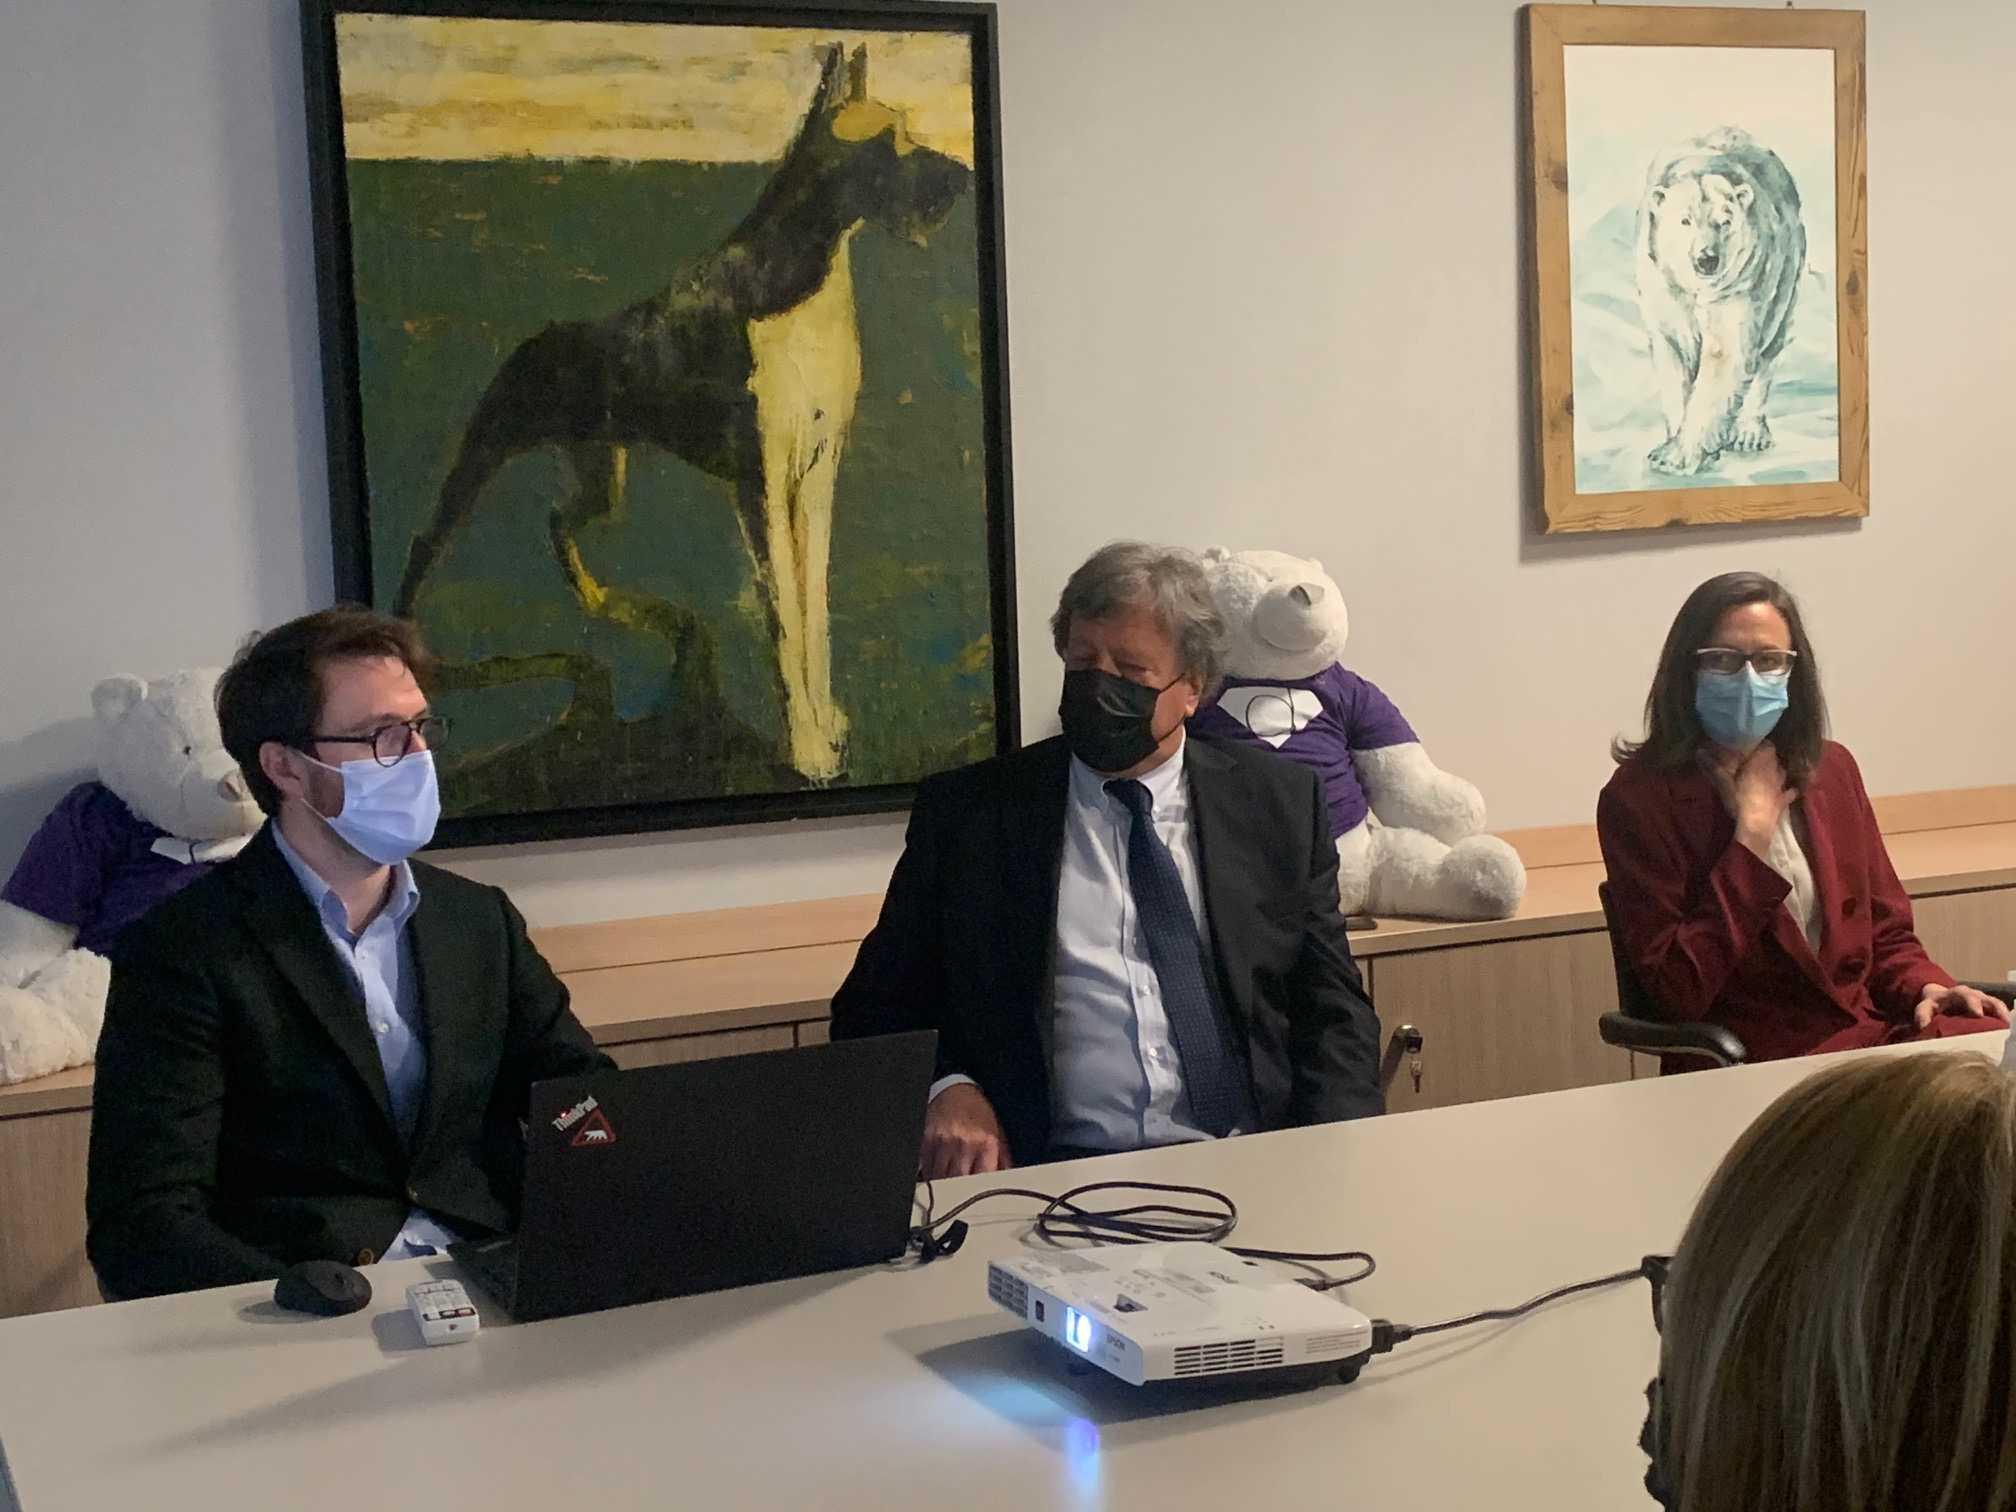 Da sinistra Emanuele, Massimo e Monica Mortarotti